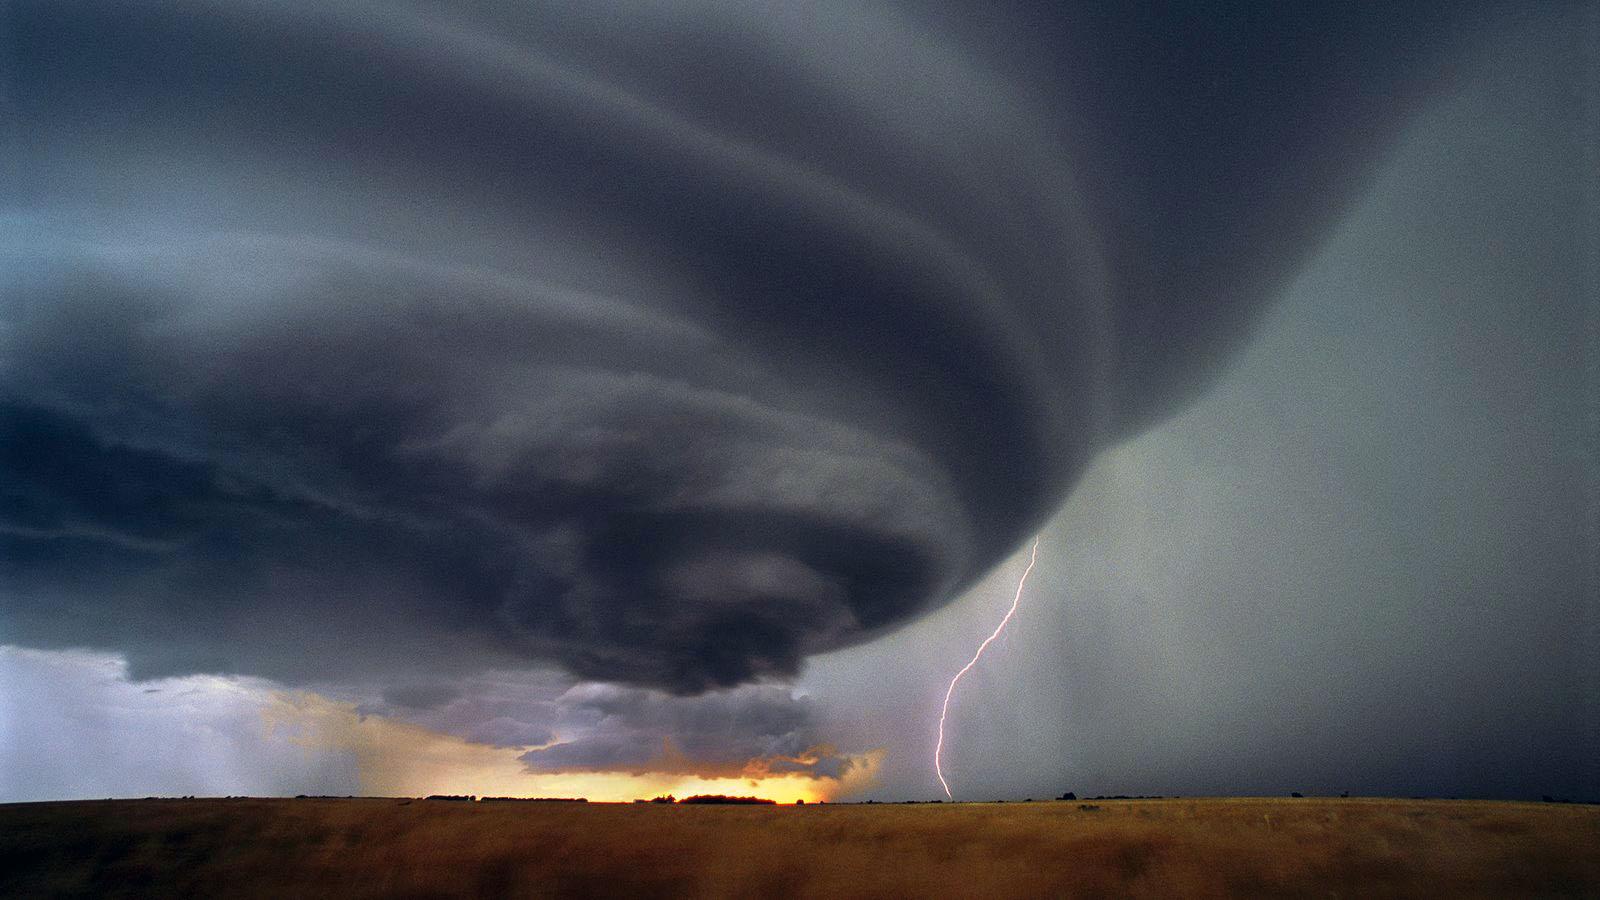 amazing thunderstorm wallpaper raging hurricane Desktop Background